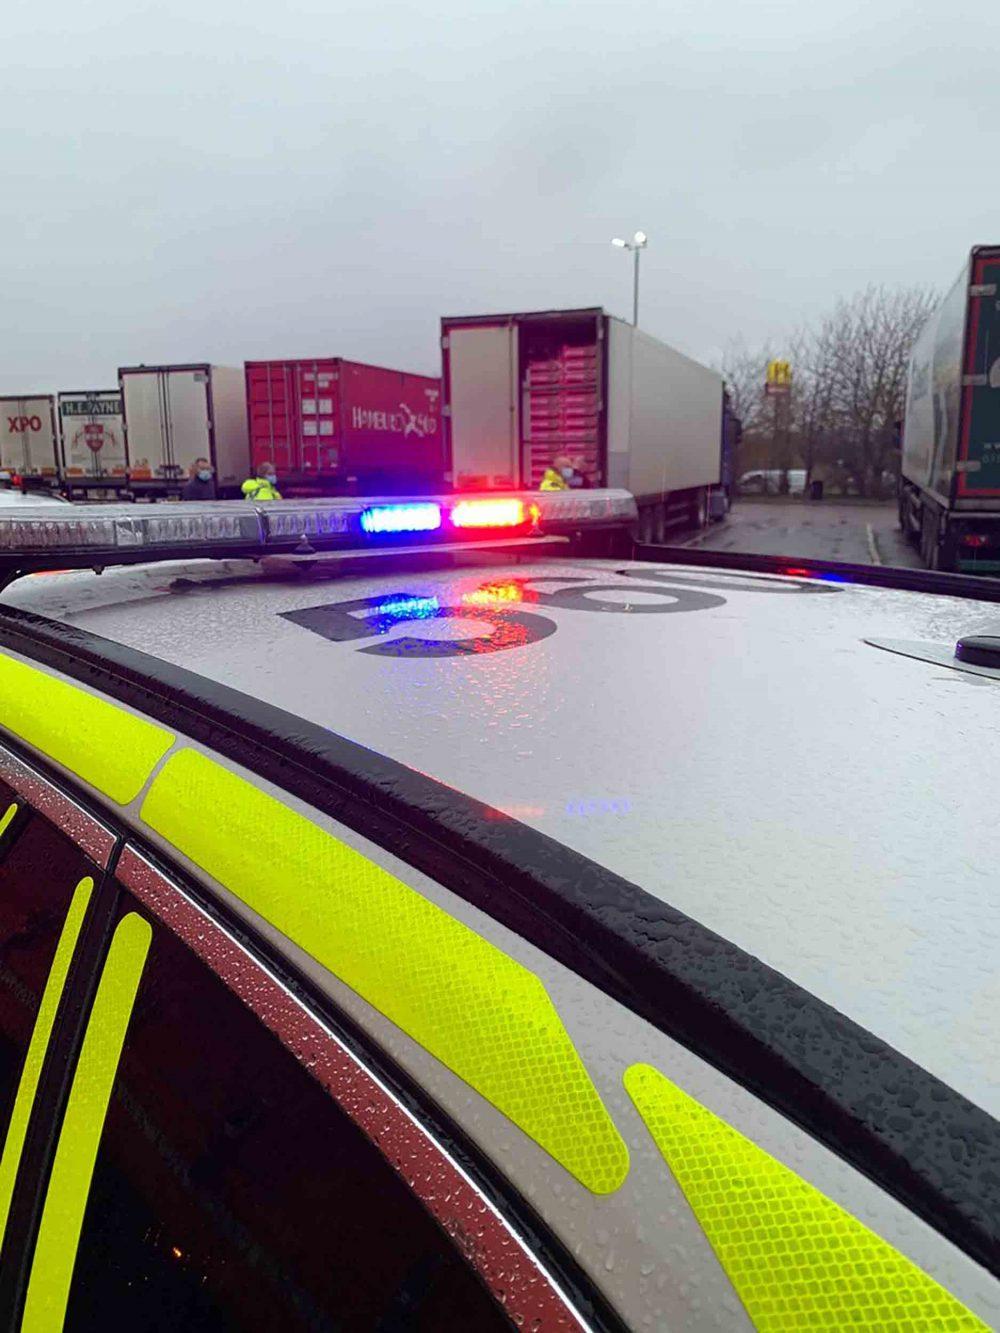 Huntingdonshire Police arrive at the scene - Crime News UK